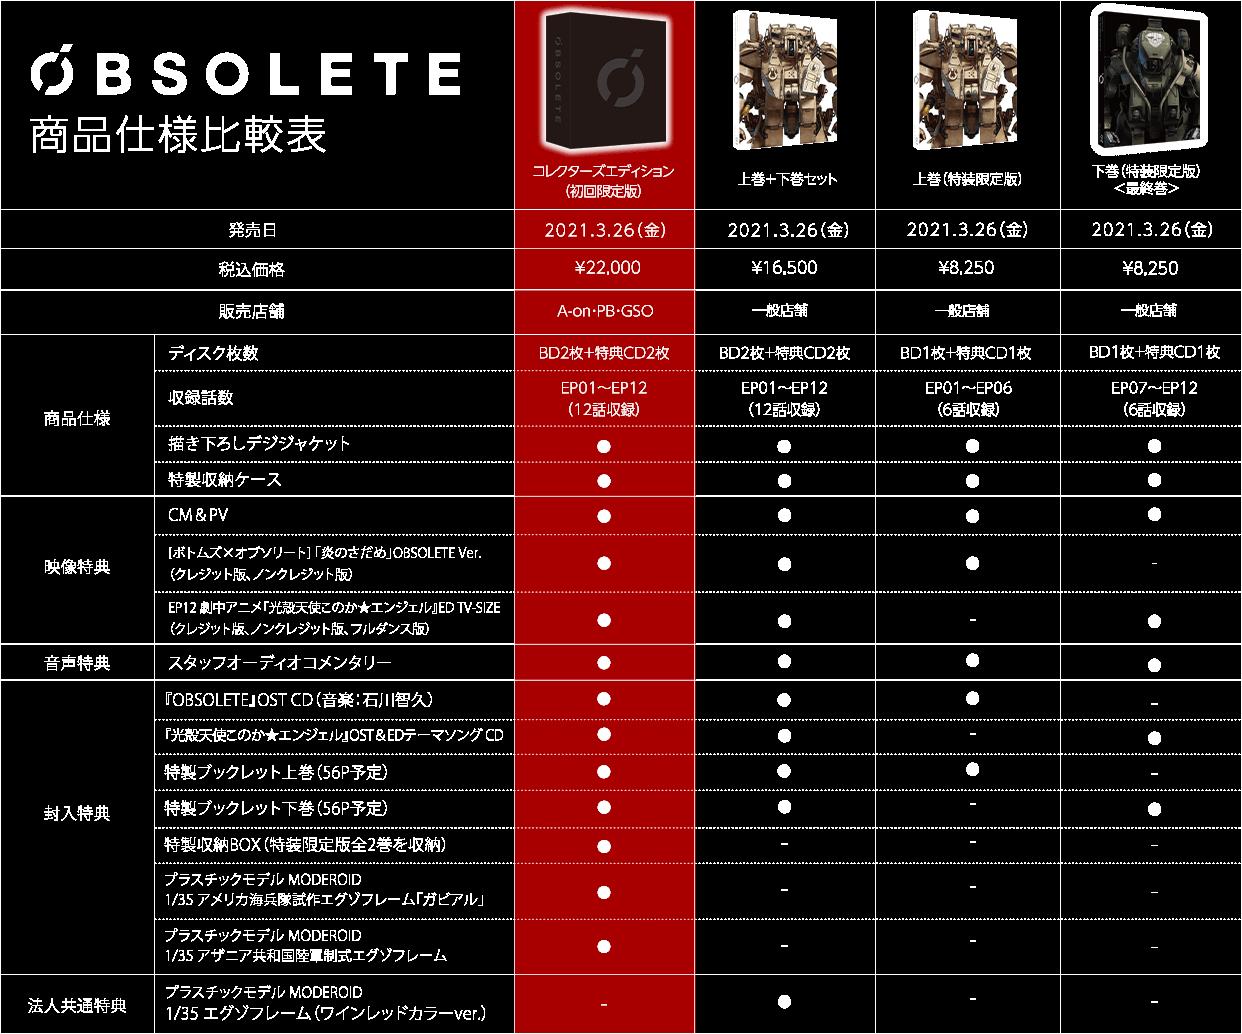 OBSOLETE商品仕様比較表